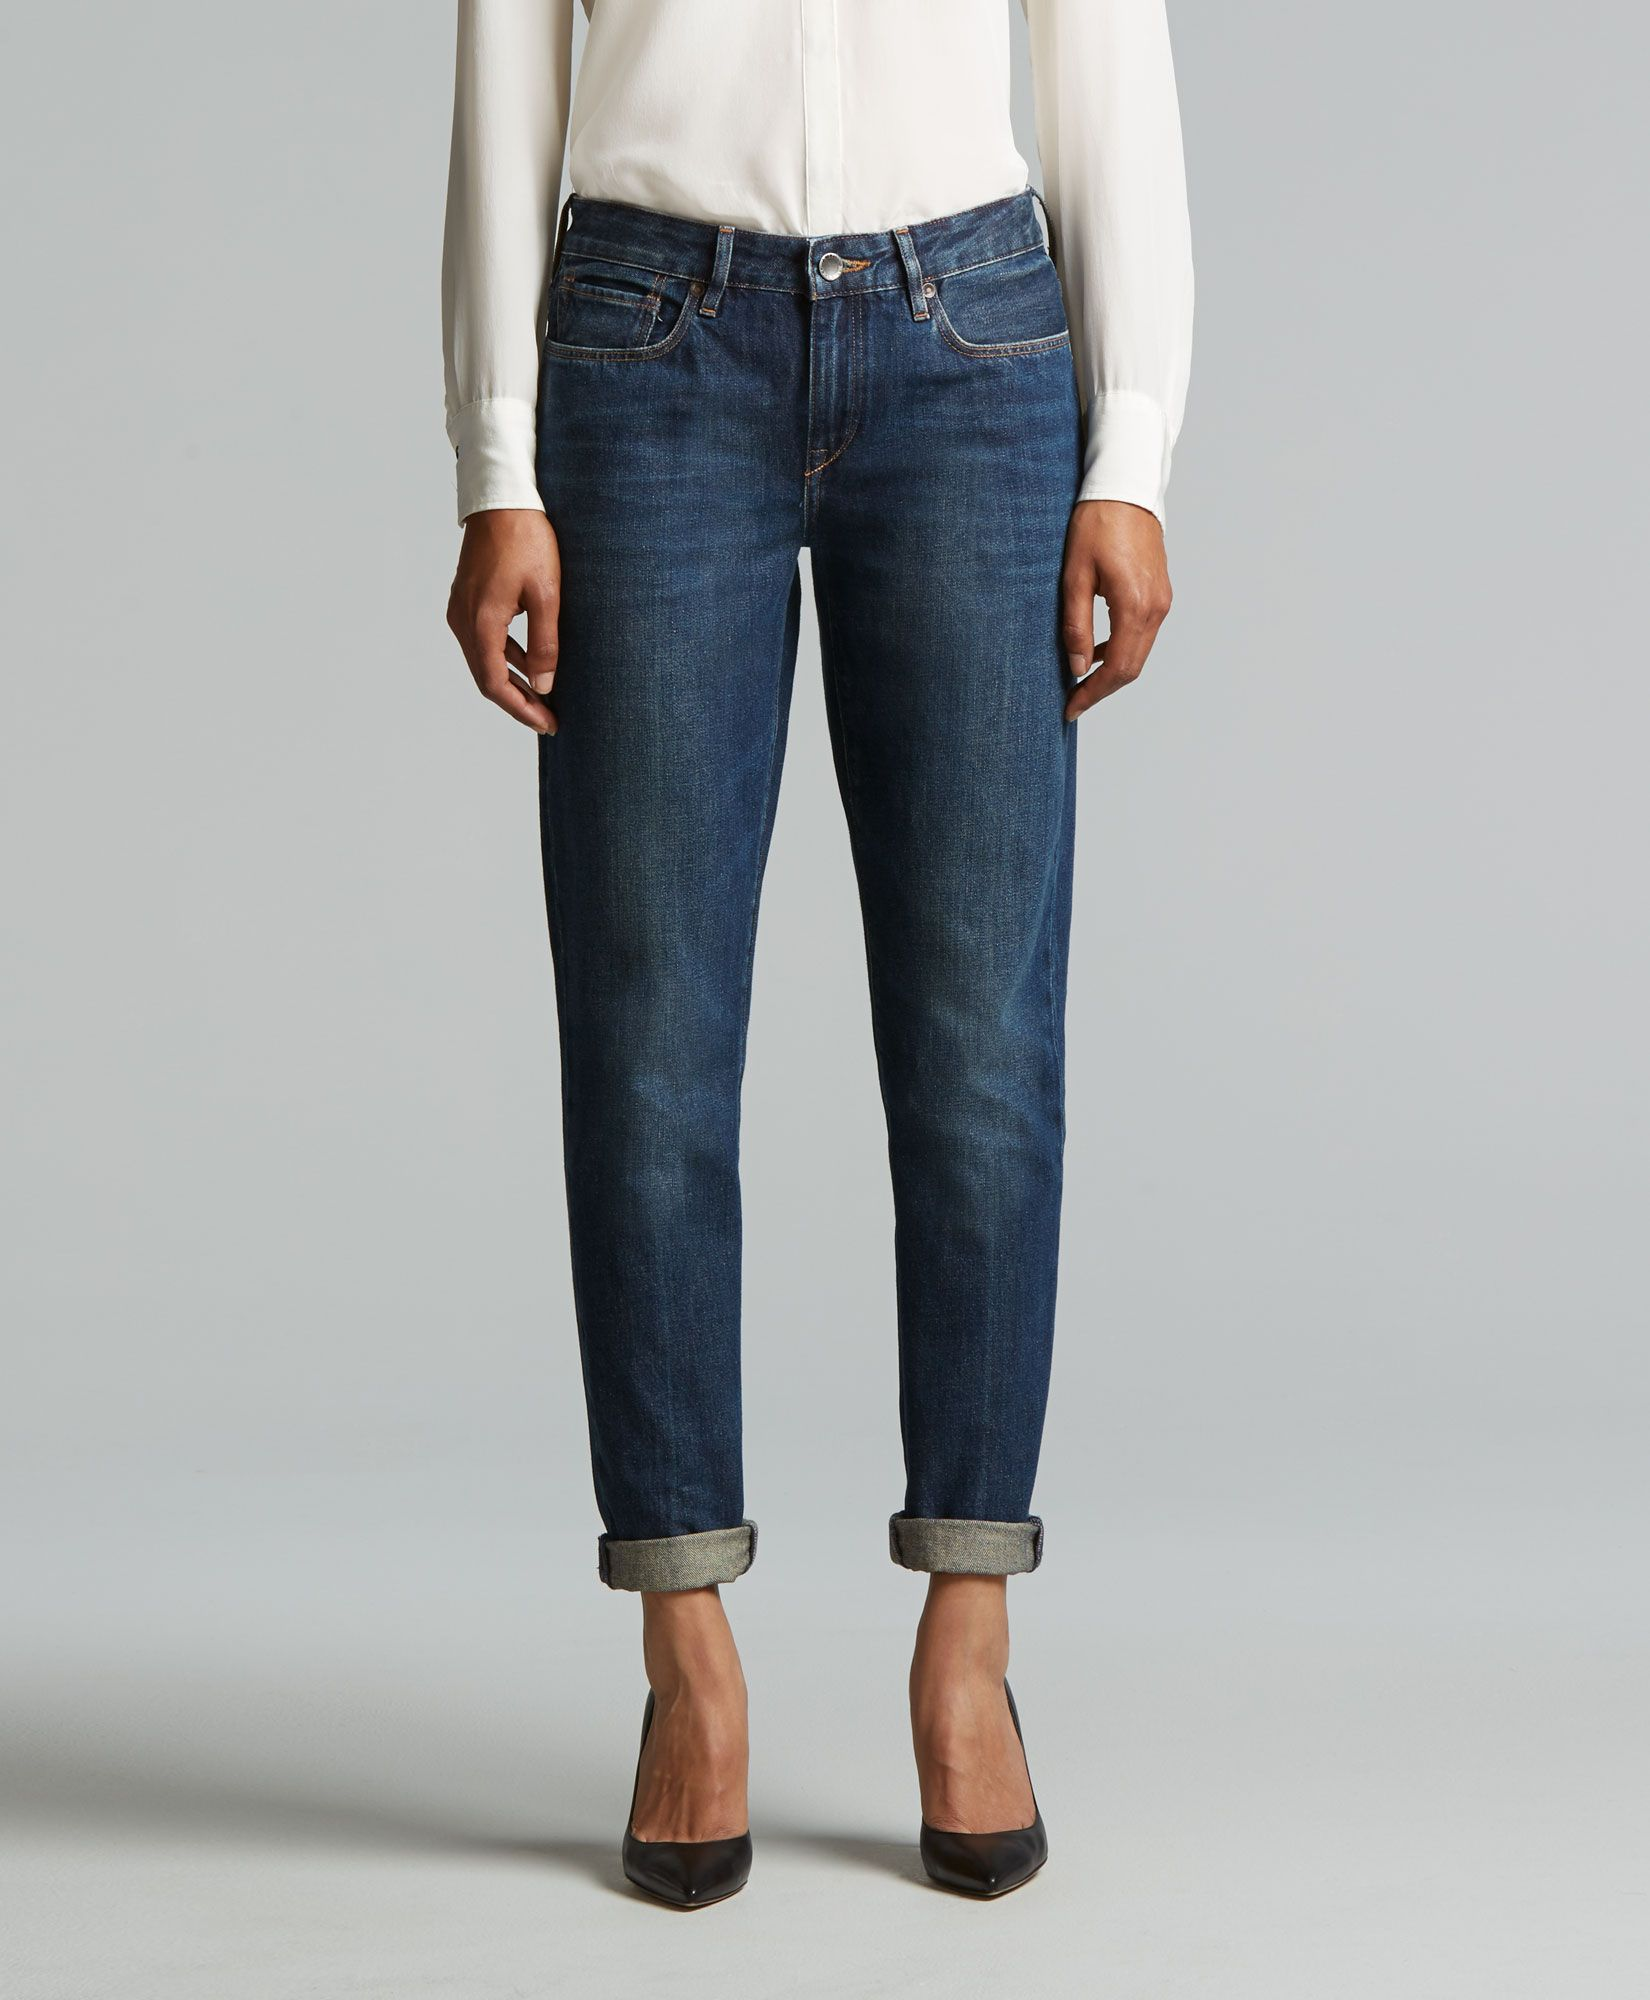 LevisBeGifted Levi's Marker Boyfriend Jeans - Dragonstone ...